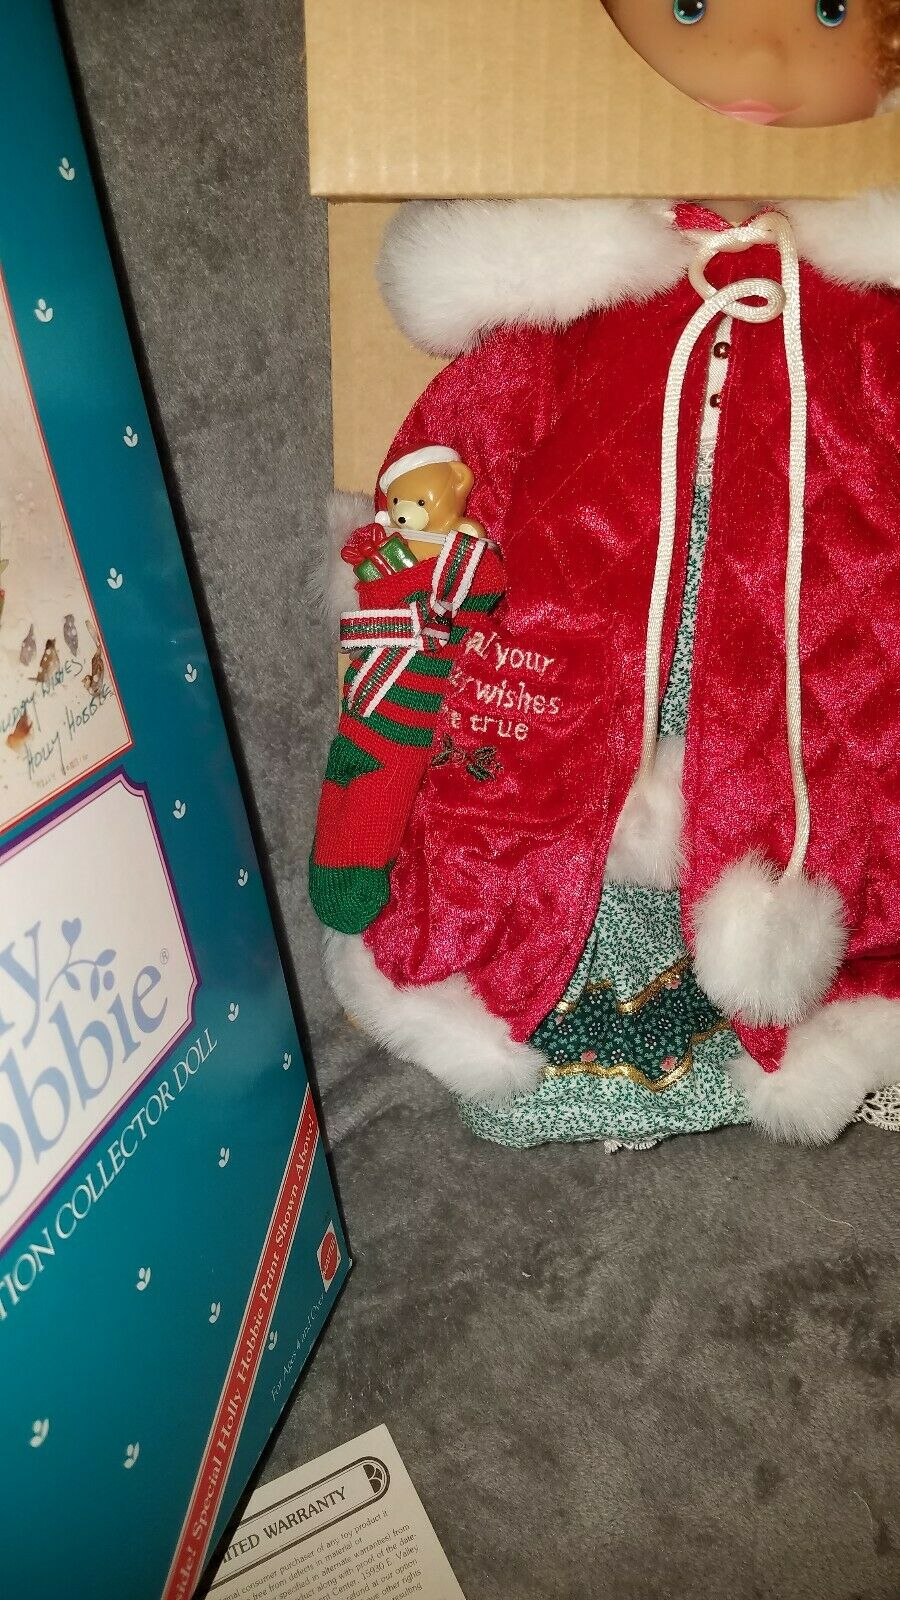 Holly Hobbie Holiday Wishes doll 14 14 14 1 2  BNIB + Shipper box Vintage LTD Ed  5078 89c823